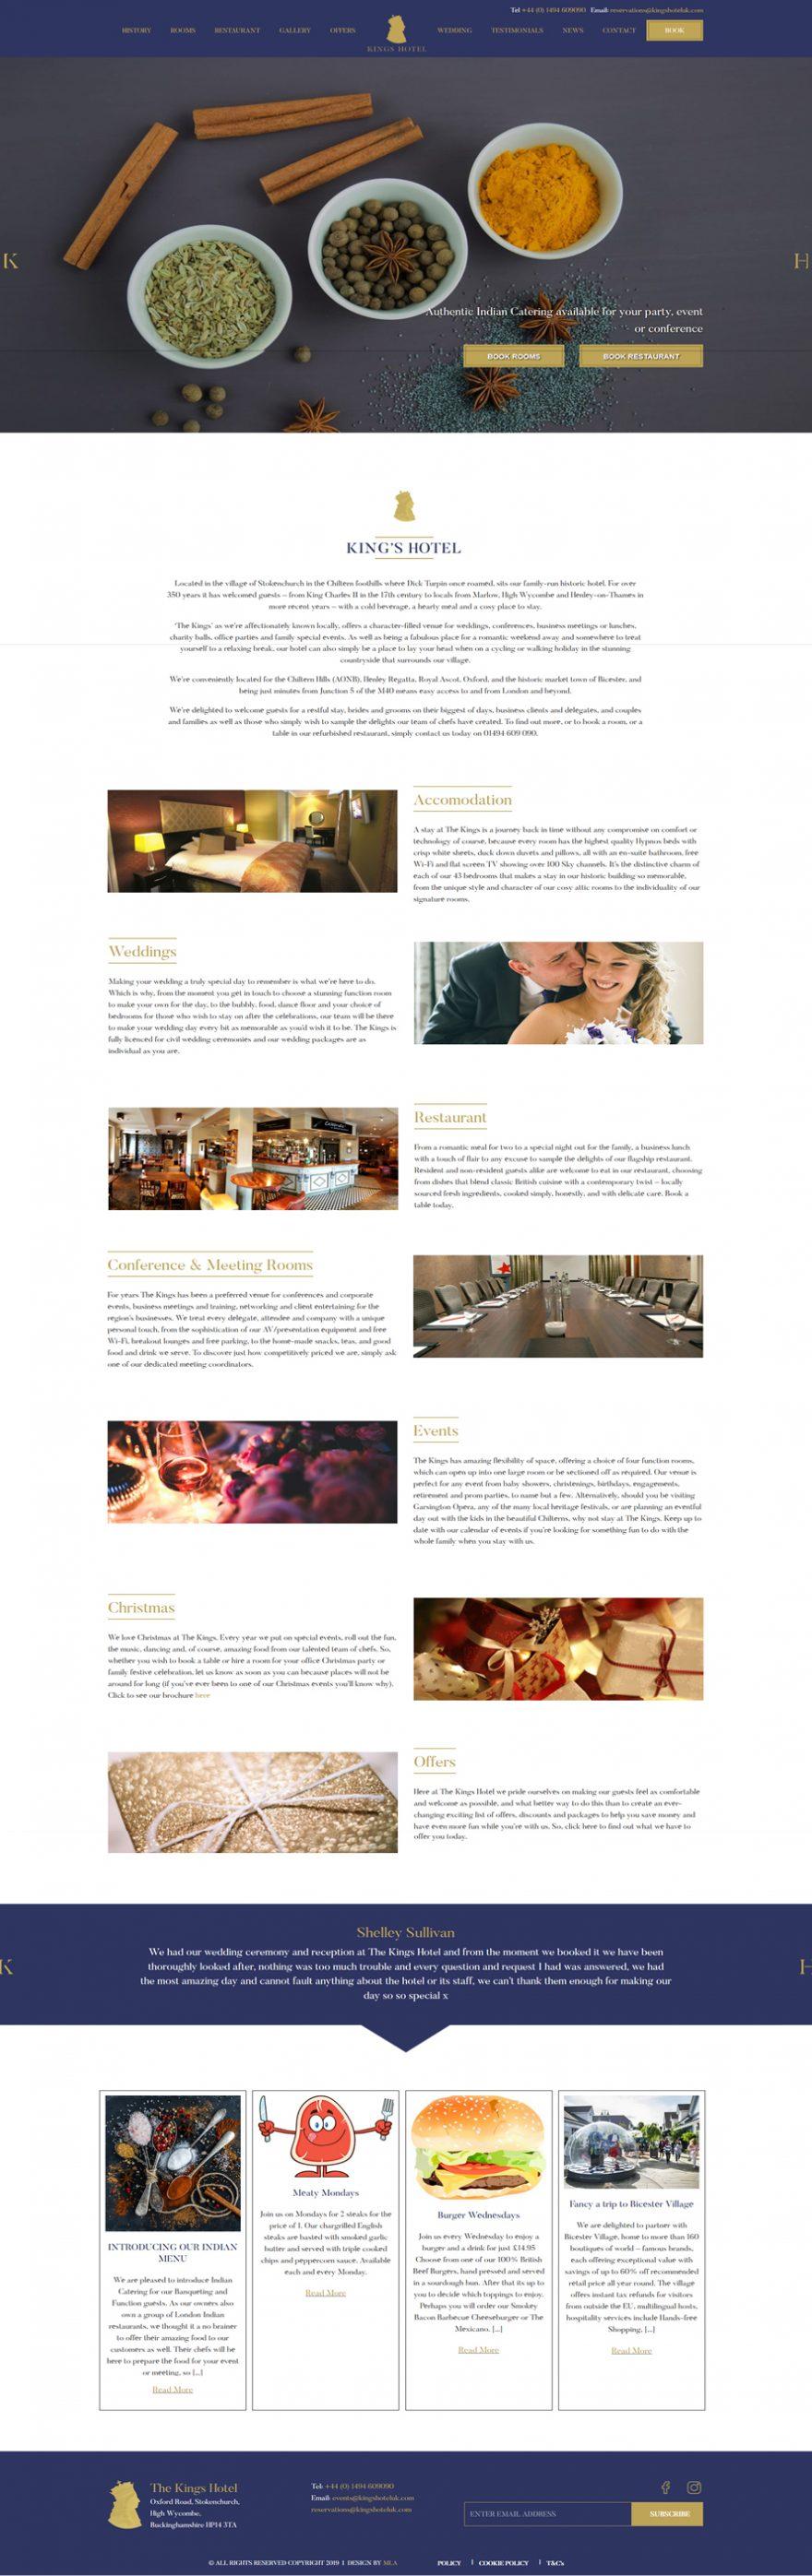 kings hotel homepage - Web design London - web design agency london